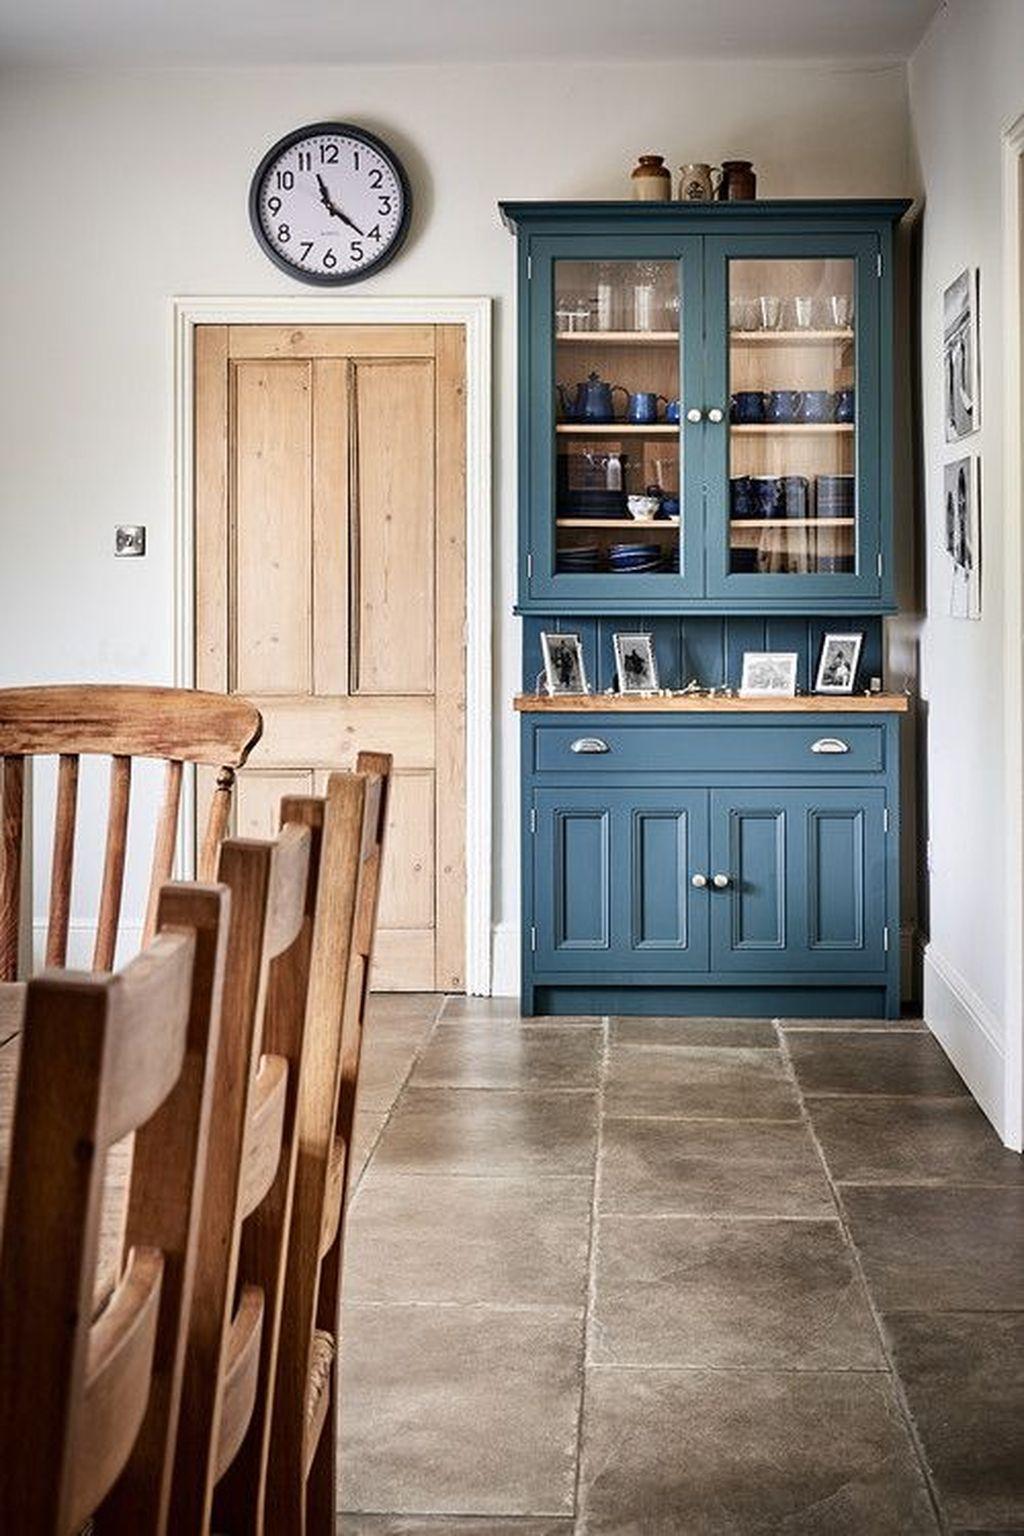 Catchy Farmhouse Apartment Interior Design Ideas To Try Now 16